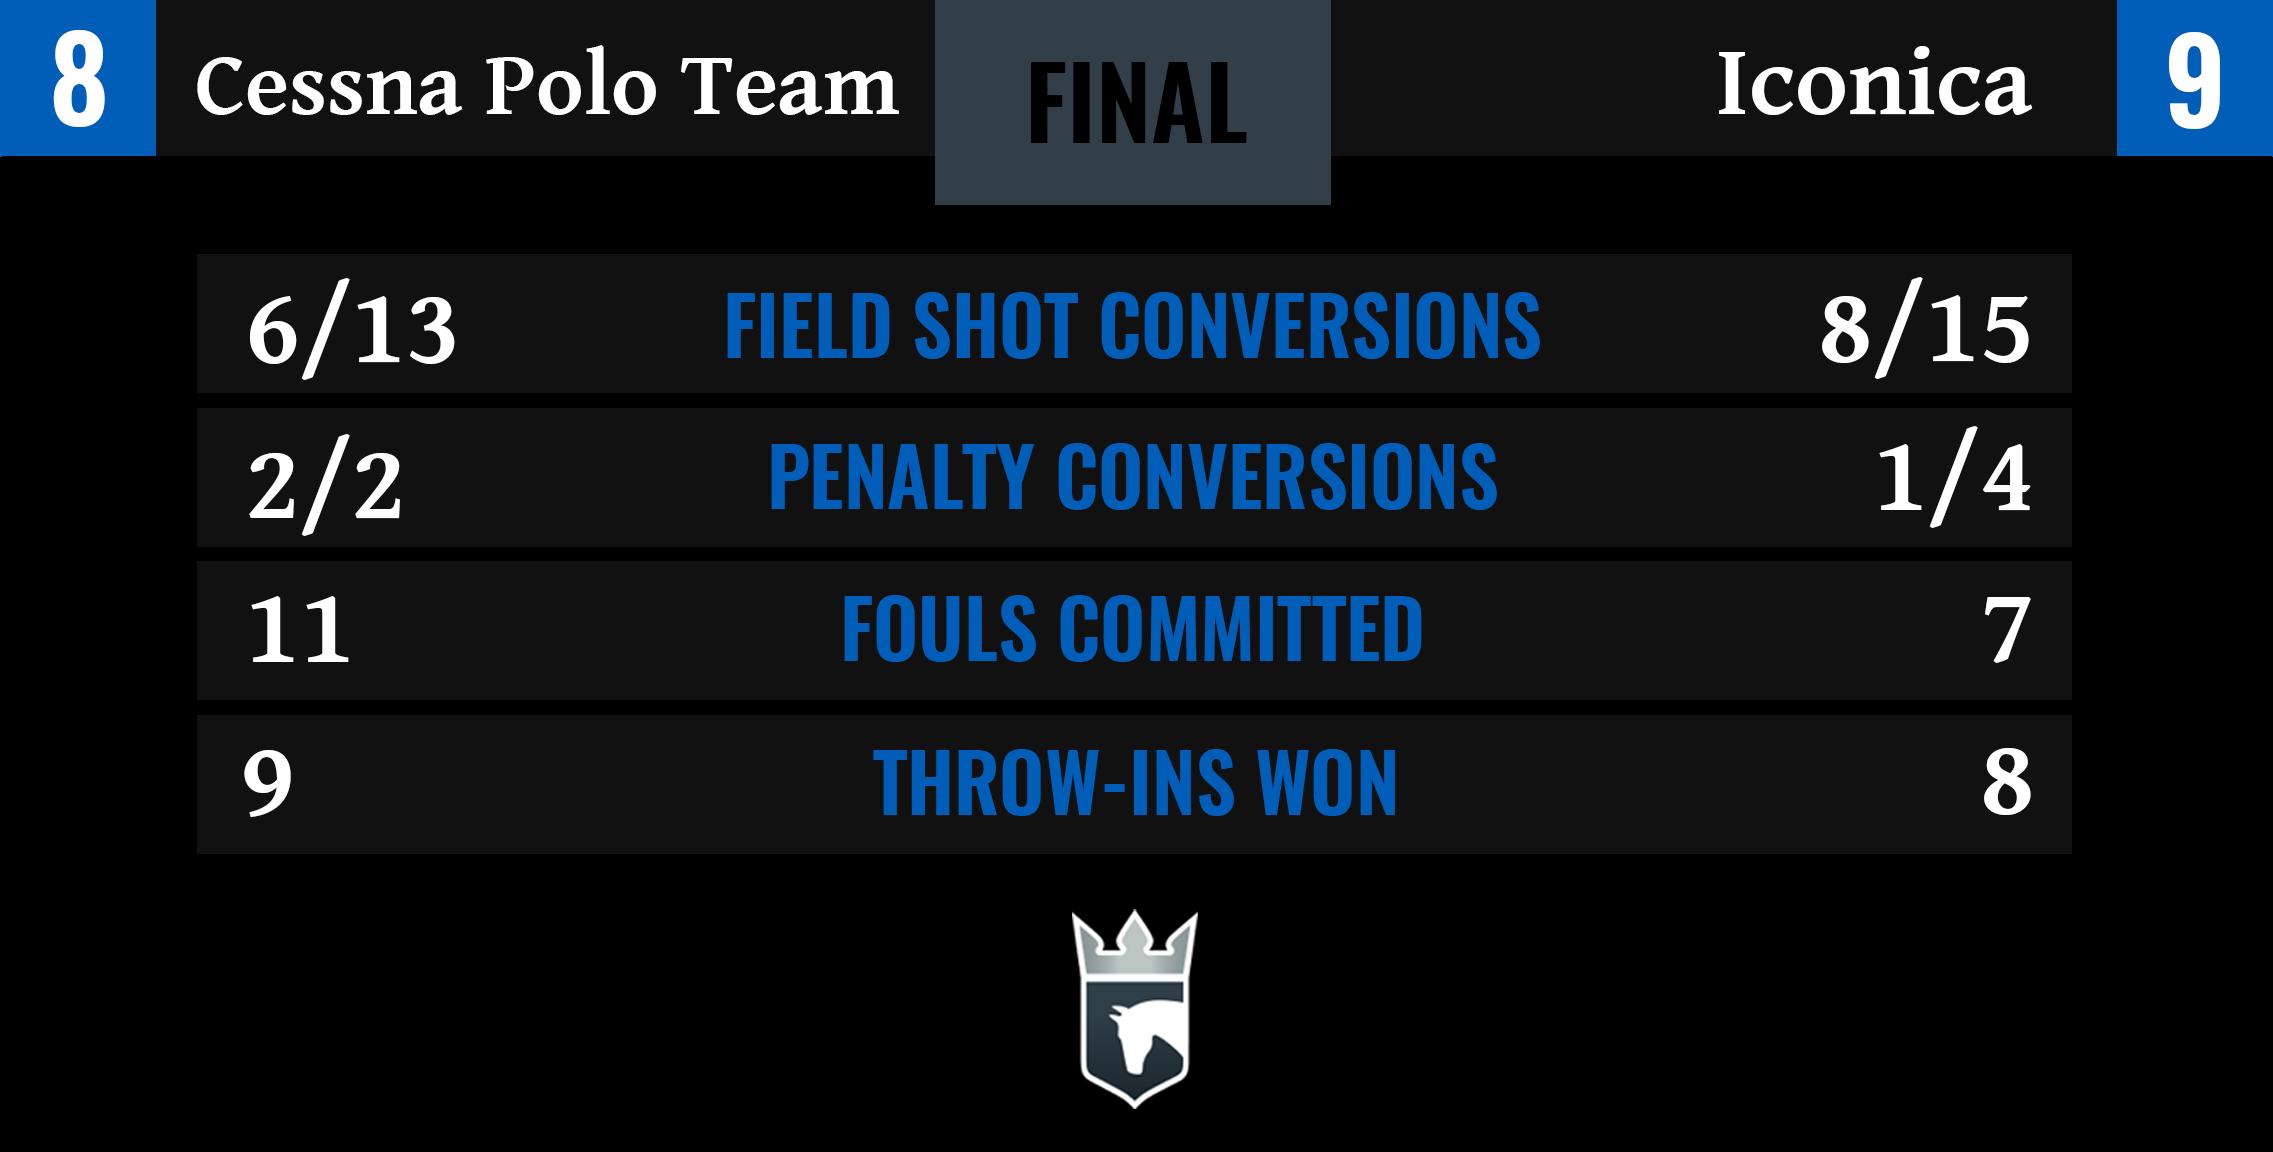 Cessna Polo Team vs Iconica Final Stats-1